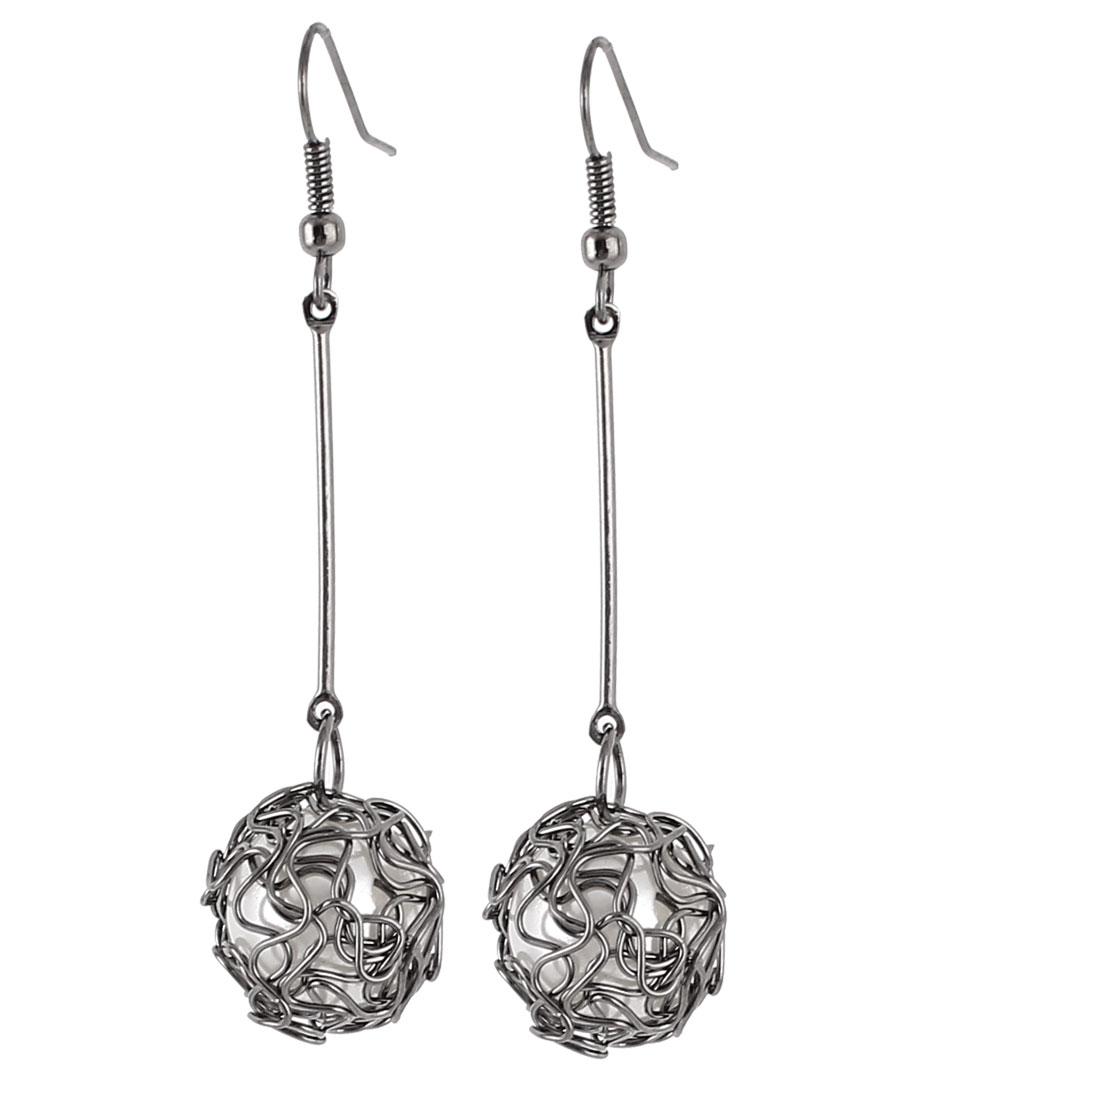 Lady Imitation Pearls Ball Shaped Pendant Fish Hook Eardrop Earrings Pair Silver Tone